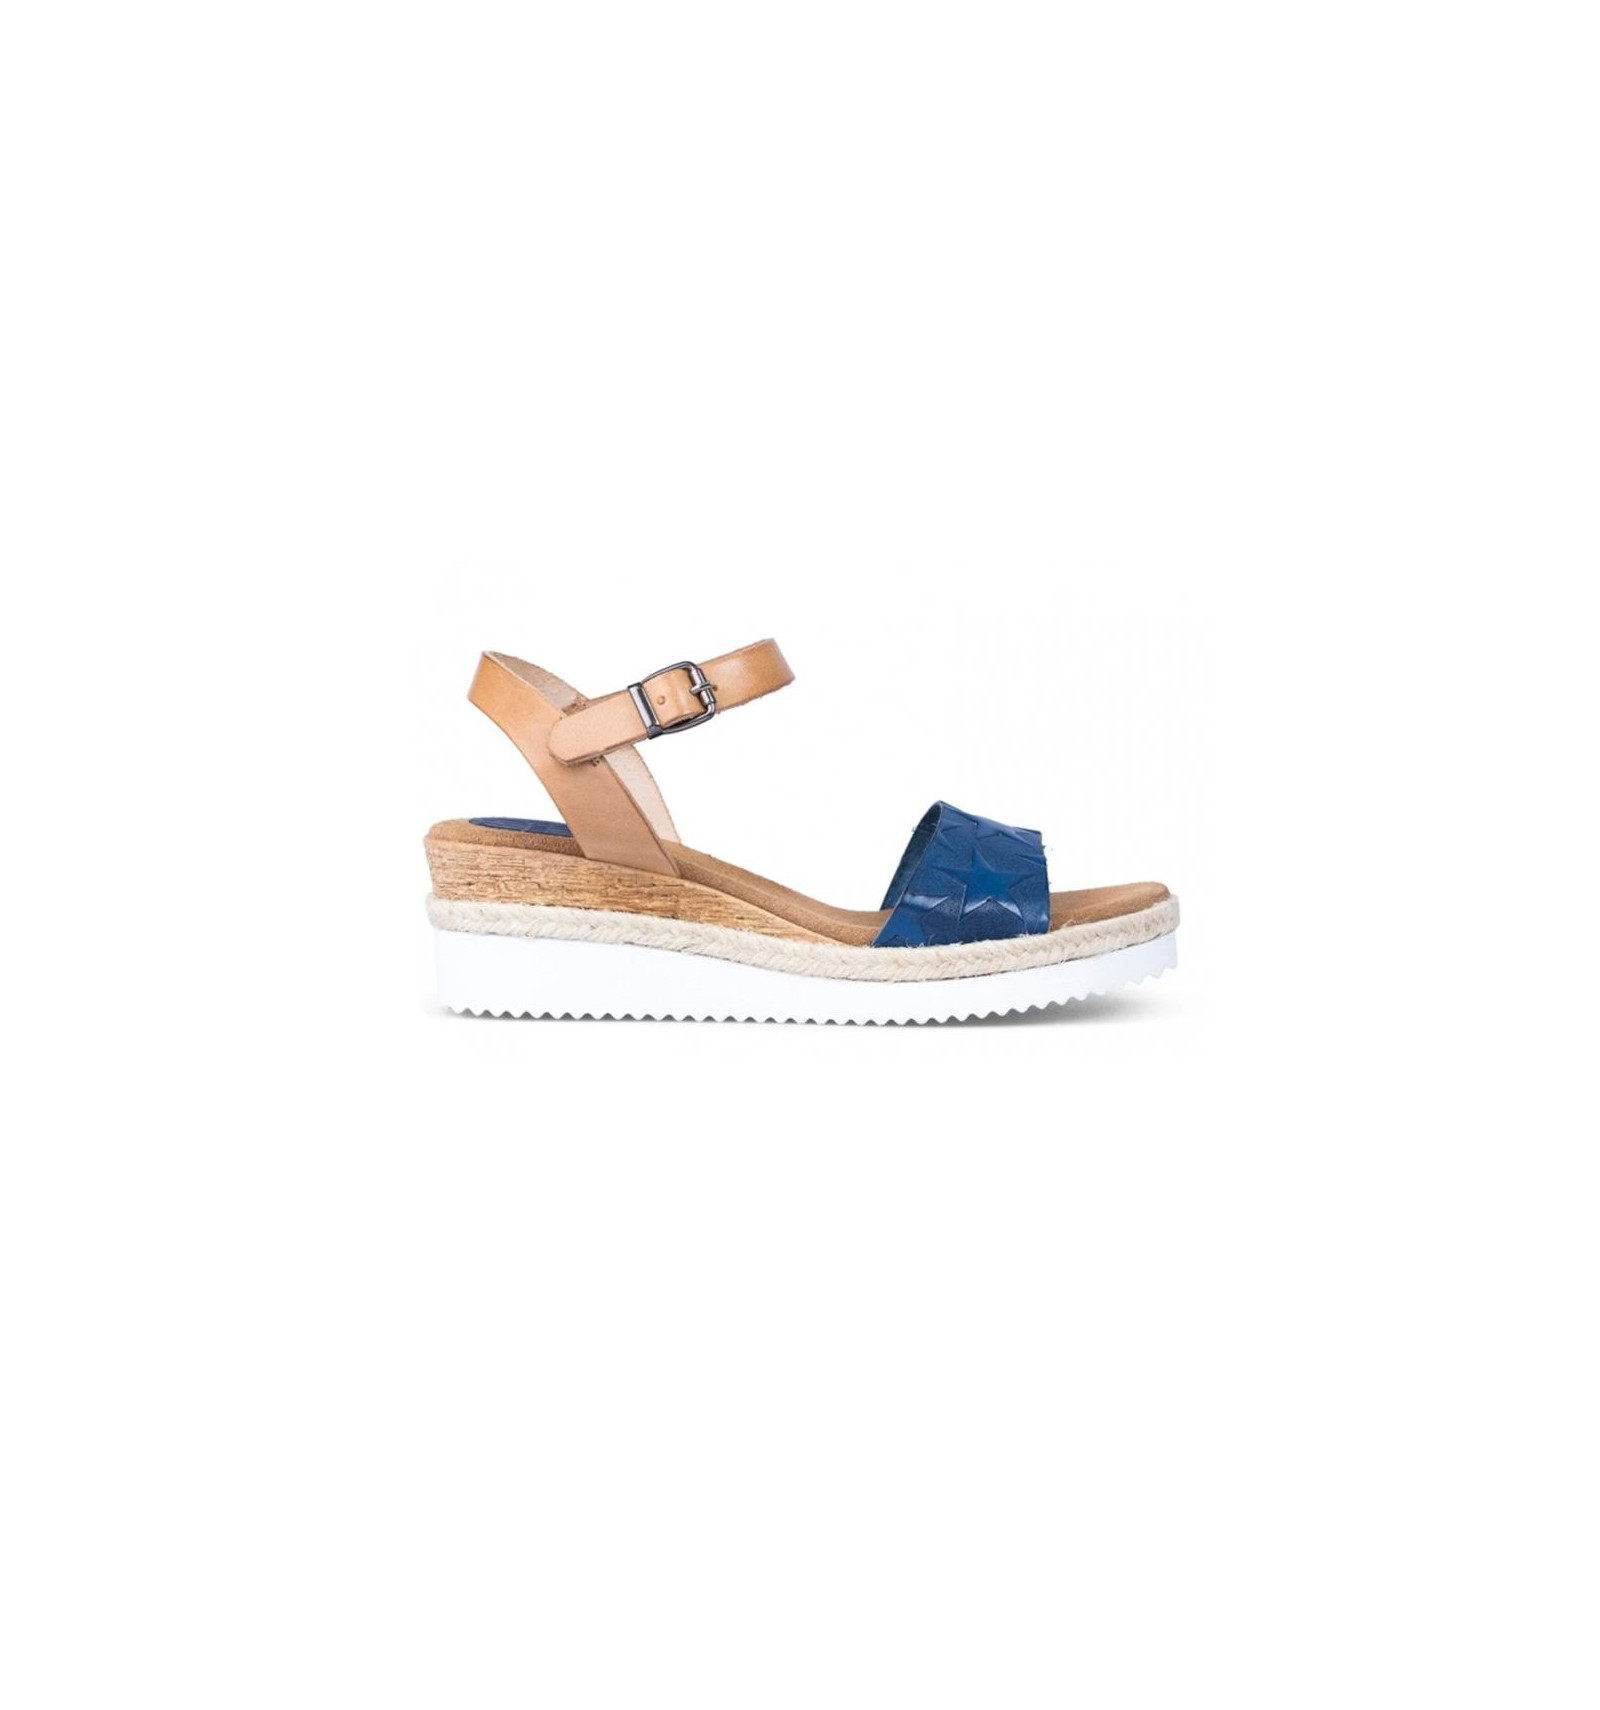 dfbaef15c36 Porronet-2429 - ADN Shoes